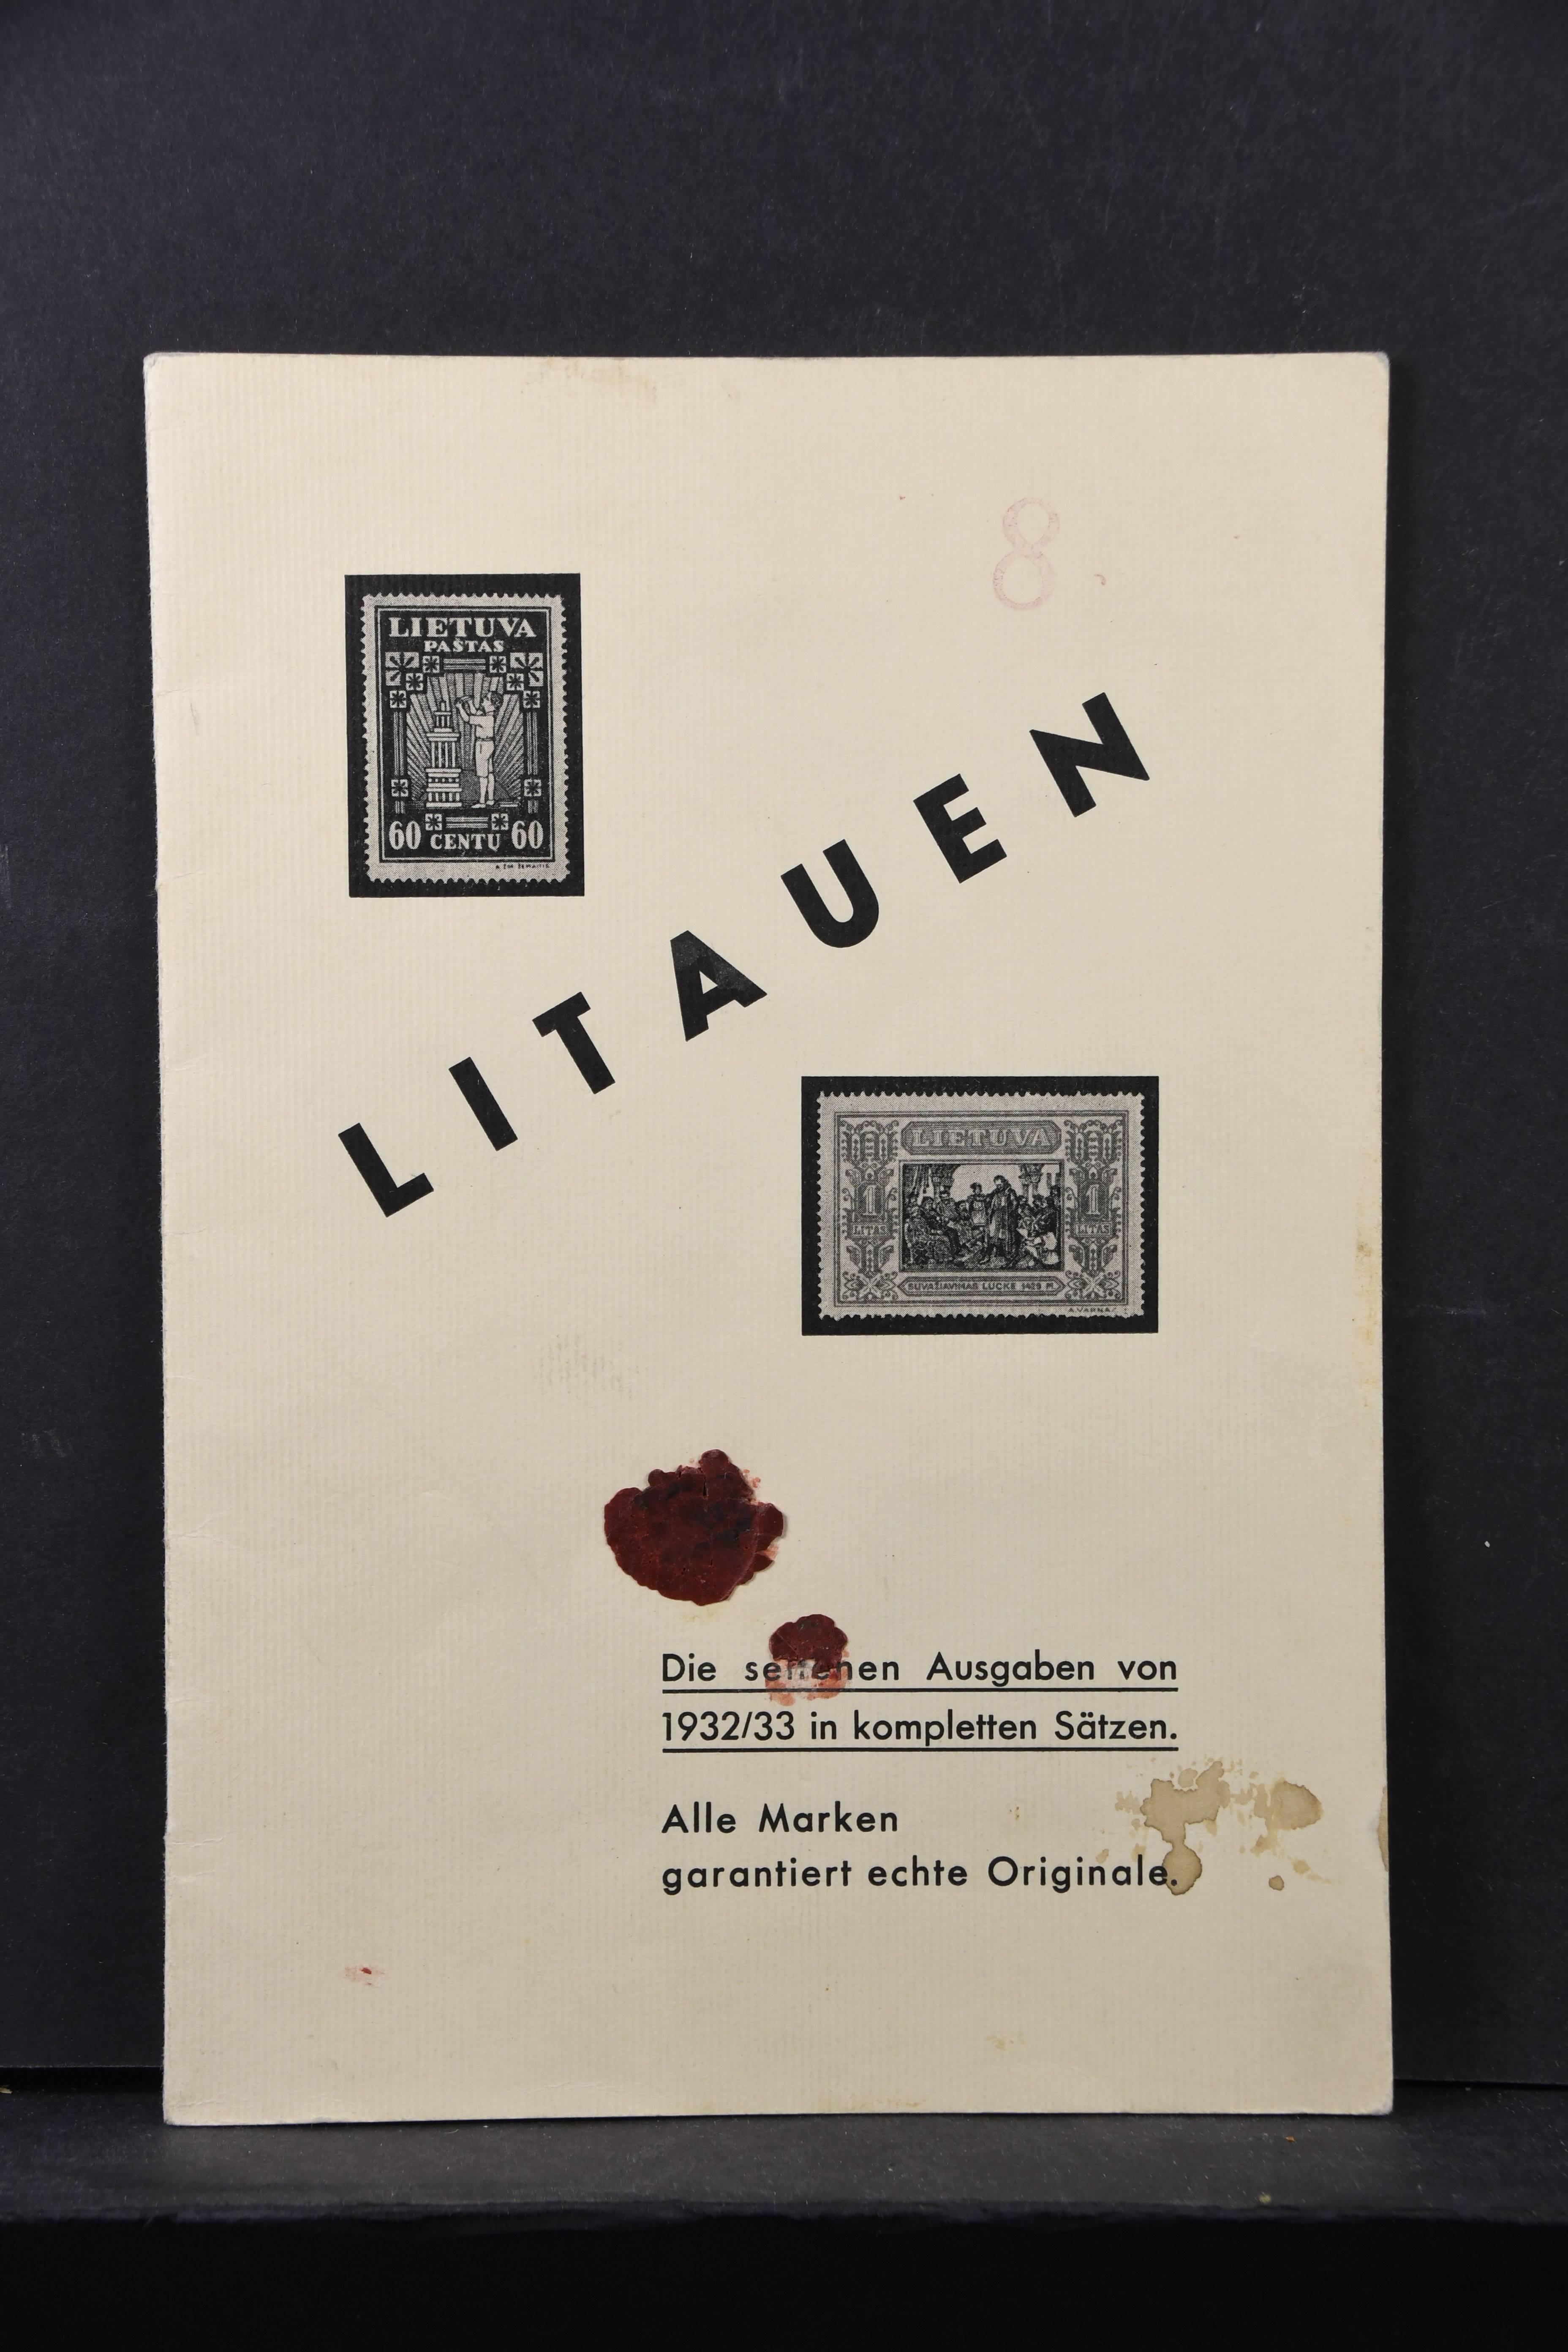 Lot 6751 - Europa A-Z_Baltikum S -  Auktionshaus Ulrich Felzmann GmbH & Co. KG Auction 170 International Autumn Auction 2020 Day 5